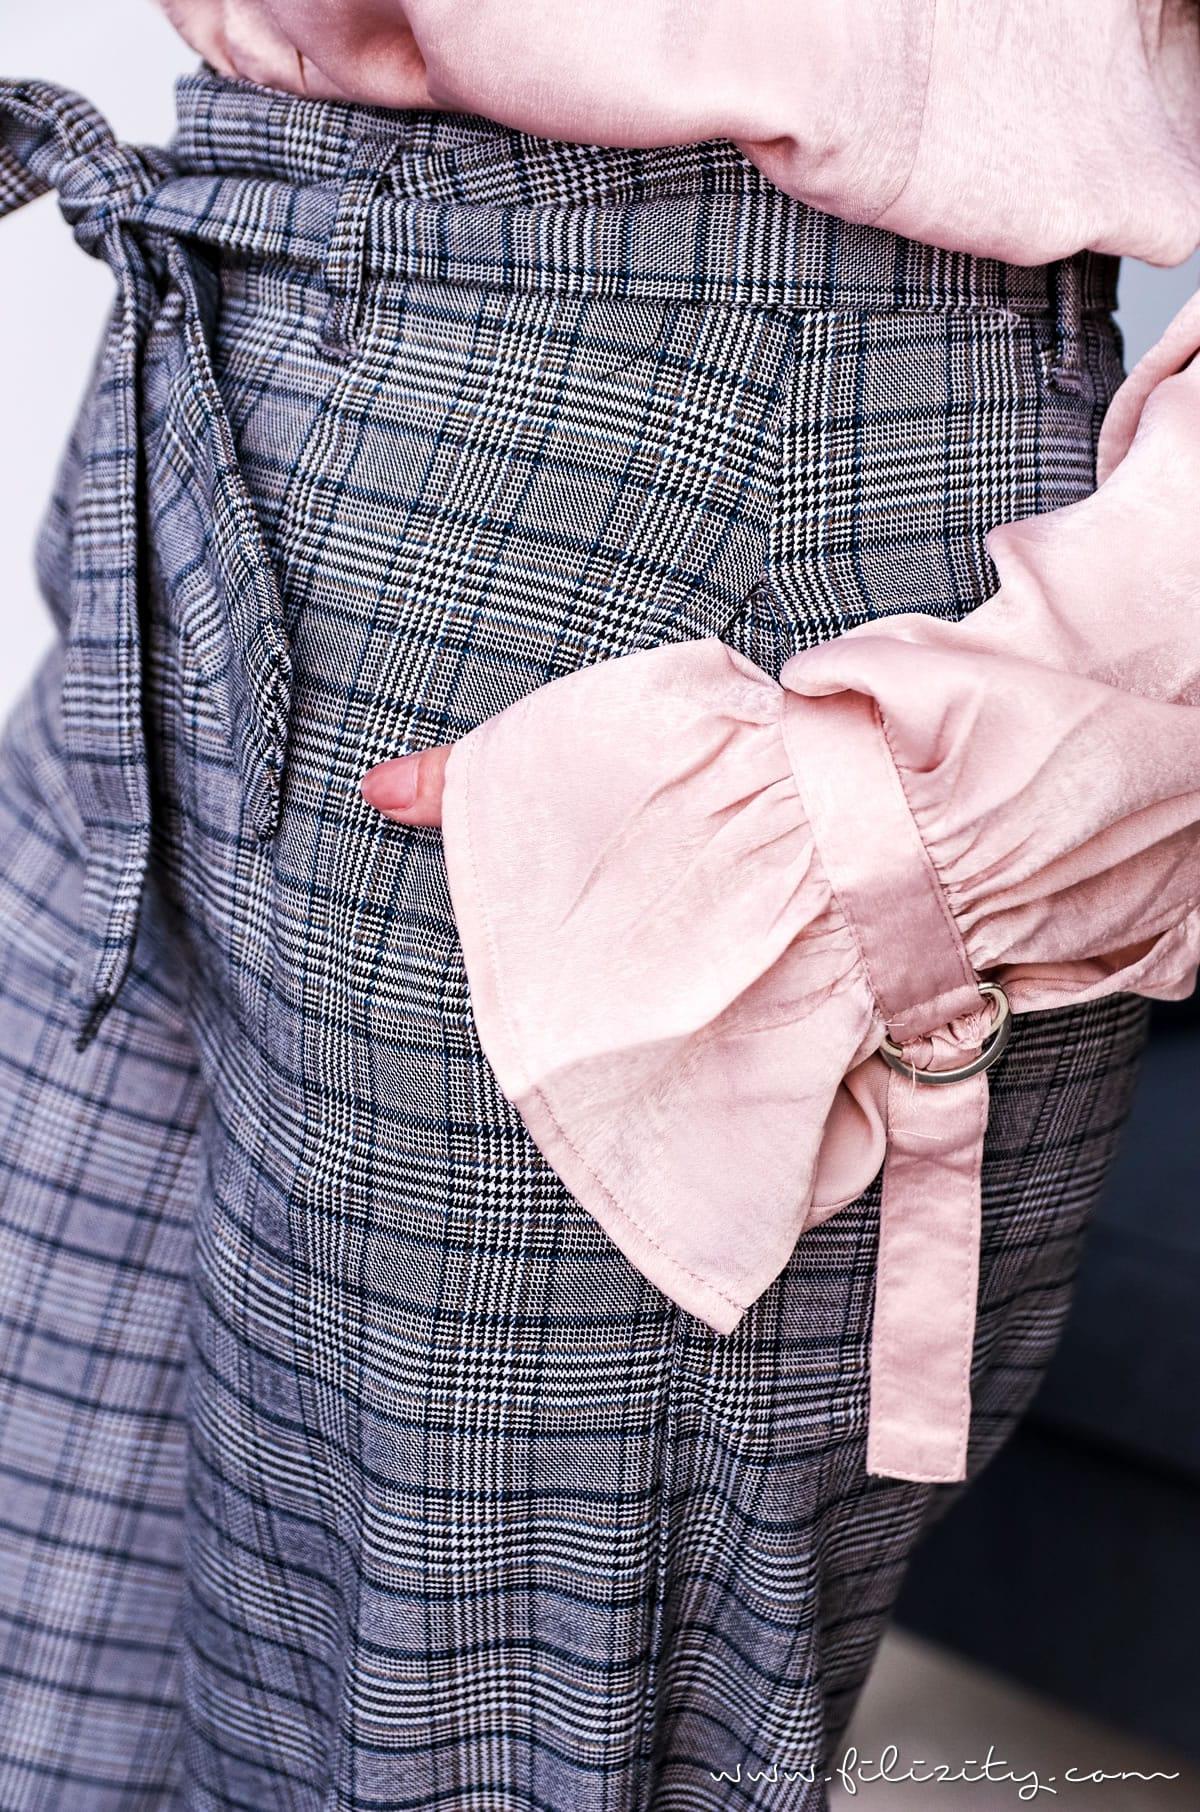 Herbst-Outfit: Glencheck Hosenanzug und Satin-Bluse mit Volant | Filizity.com | Fashion-Blog aus dem Rheinland #trends #hw2017 #glencheck